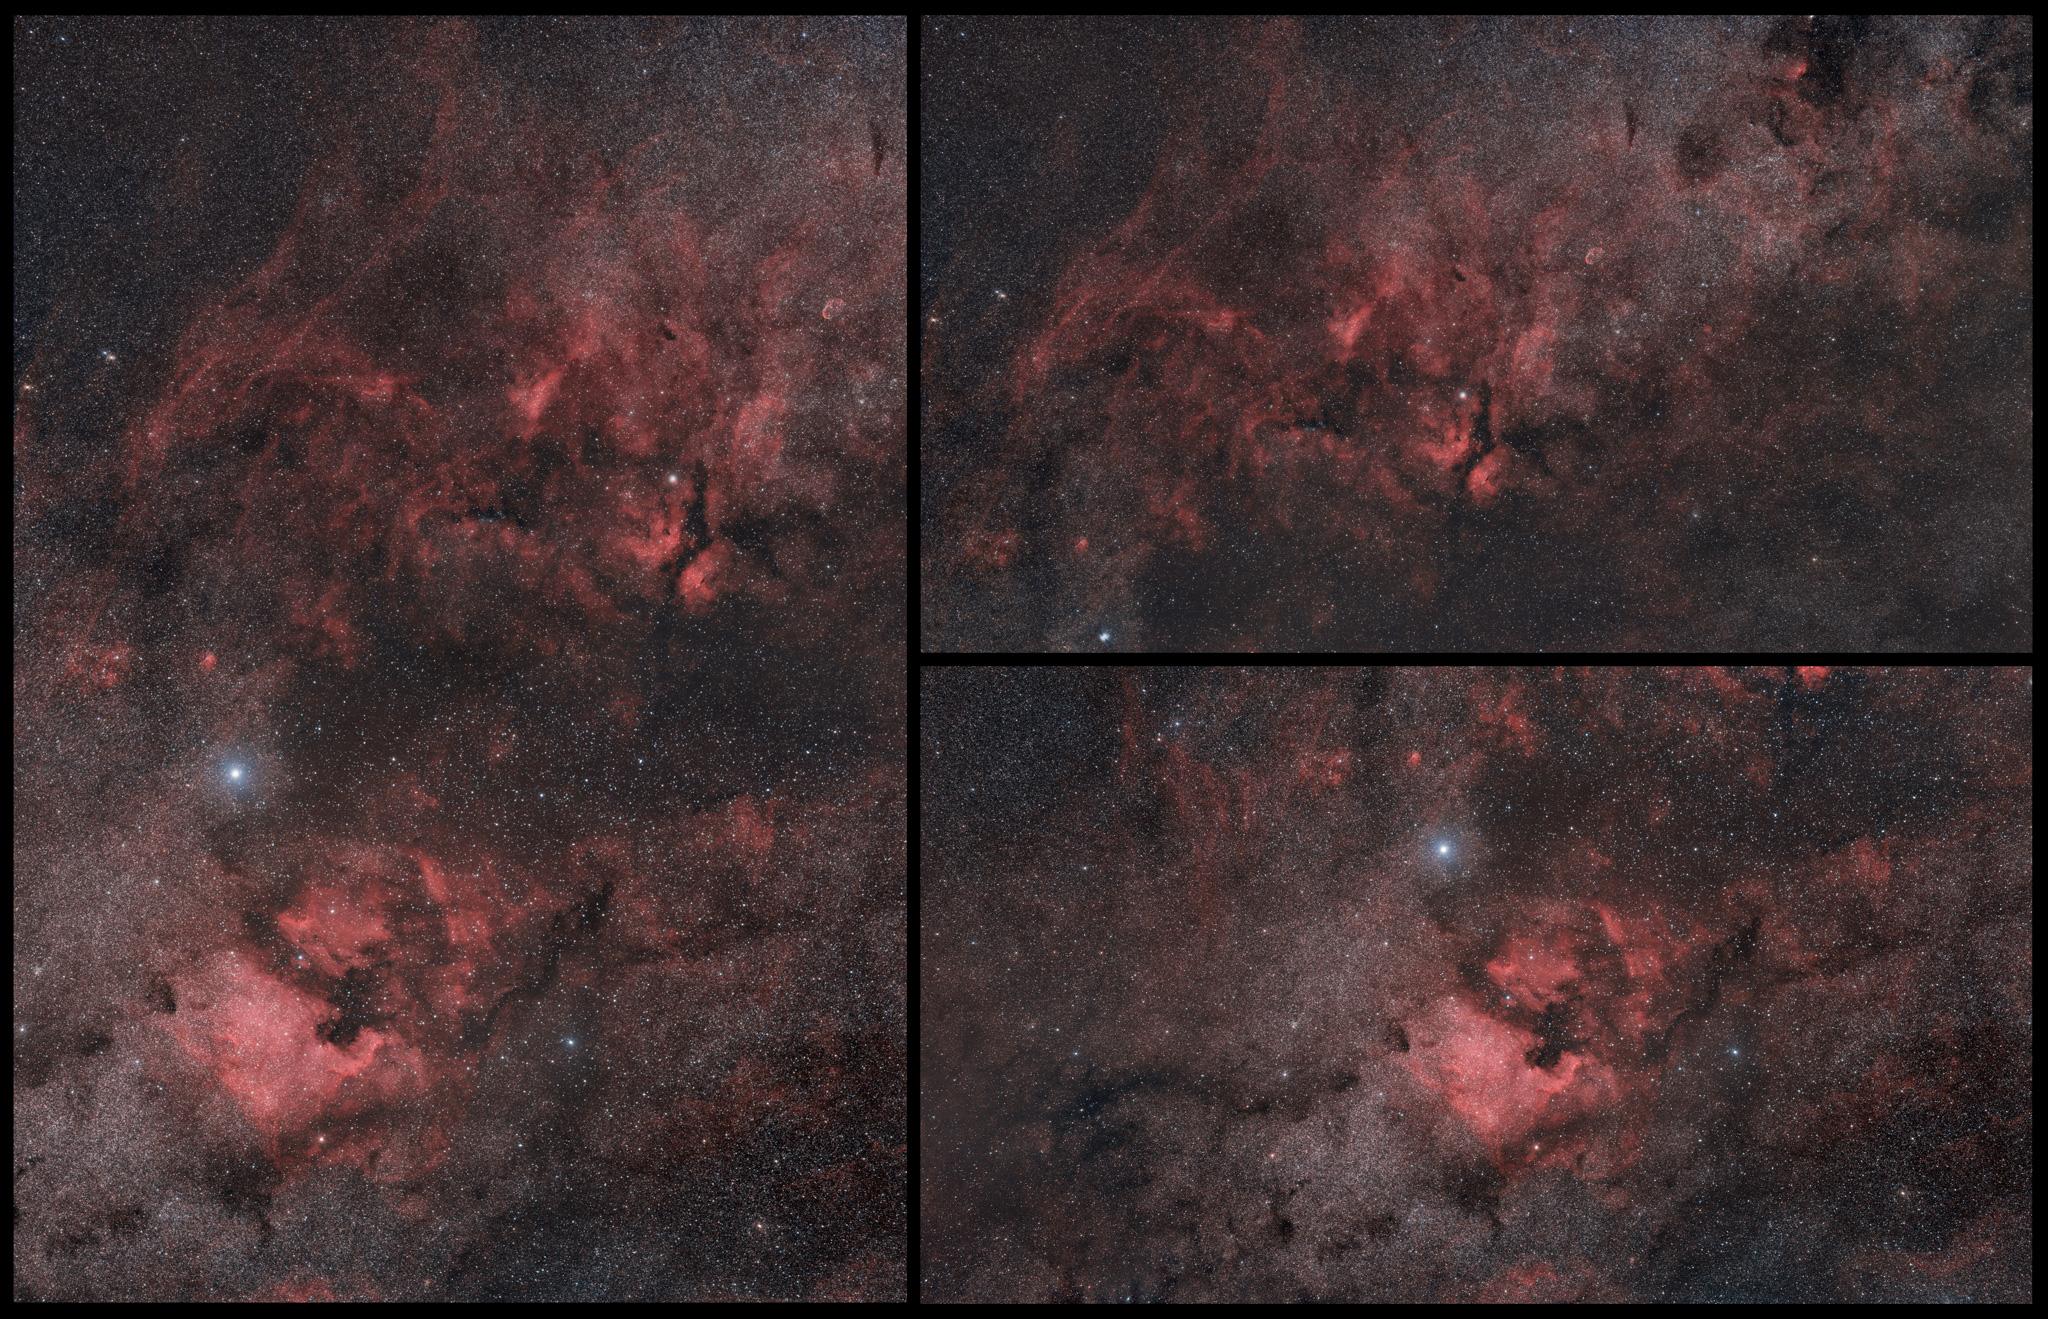 Le Cygne, le Sagittaire, Rho Ophiuchi au A7s 135mm MosaicA7s2k